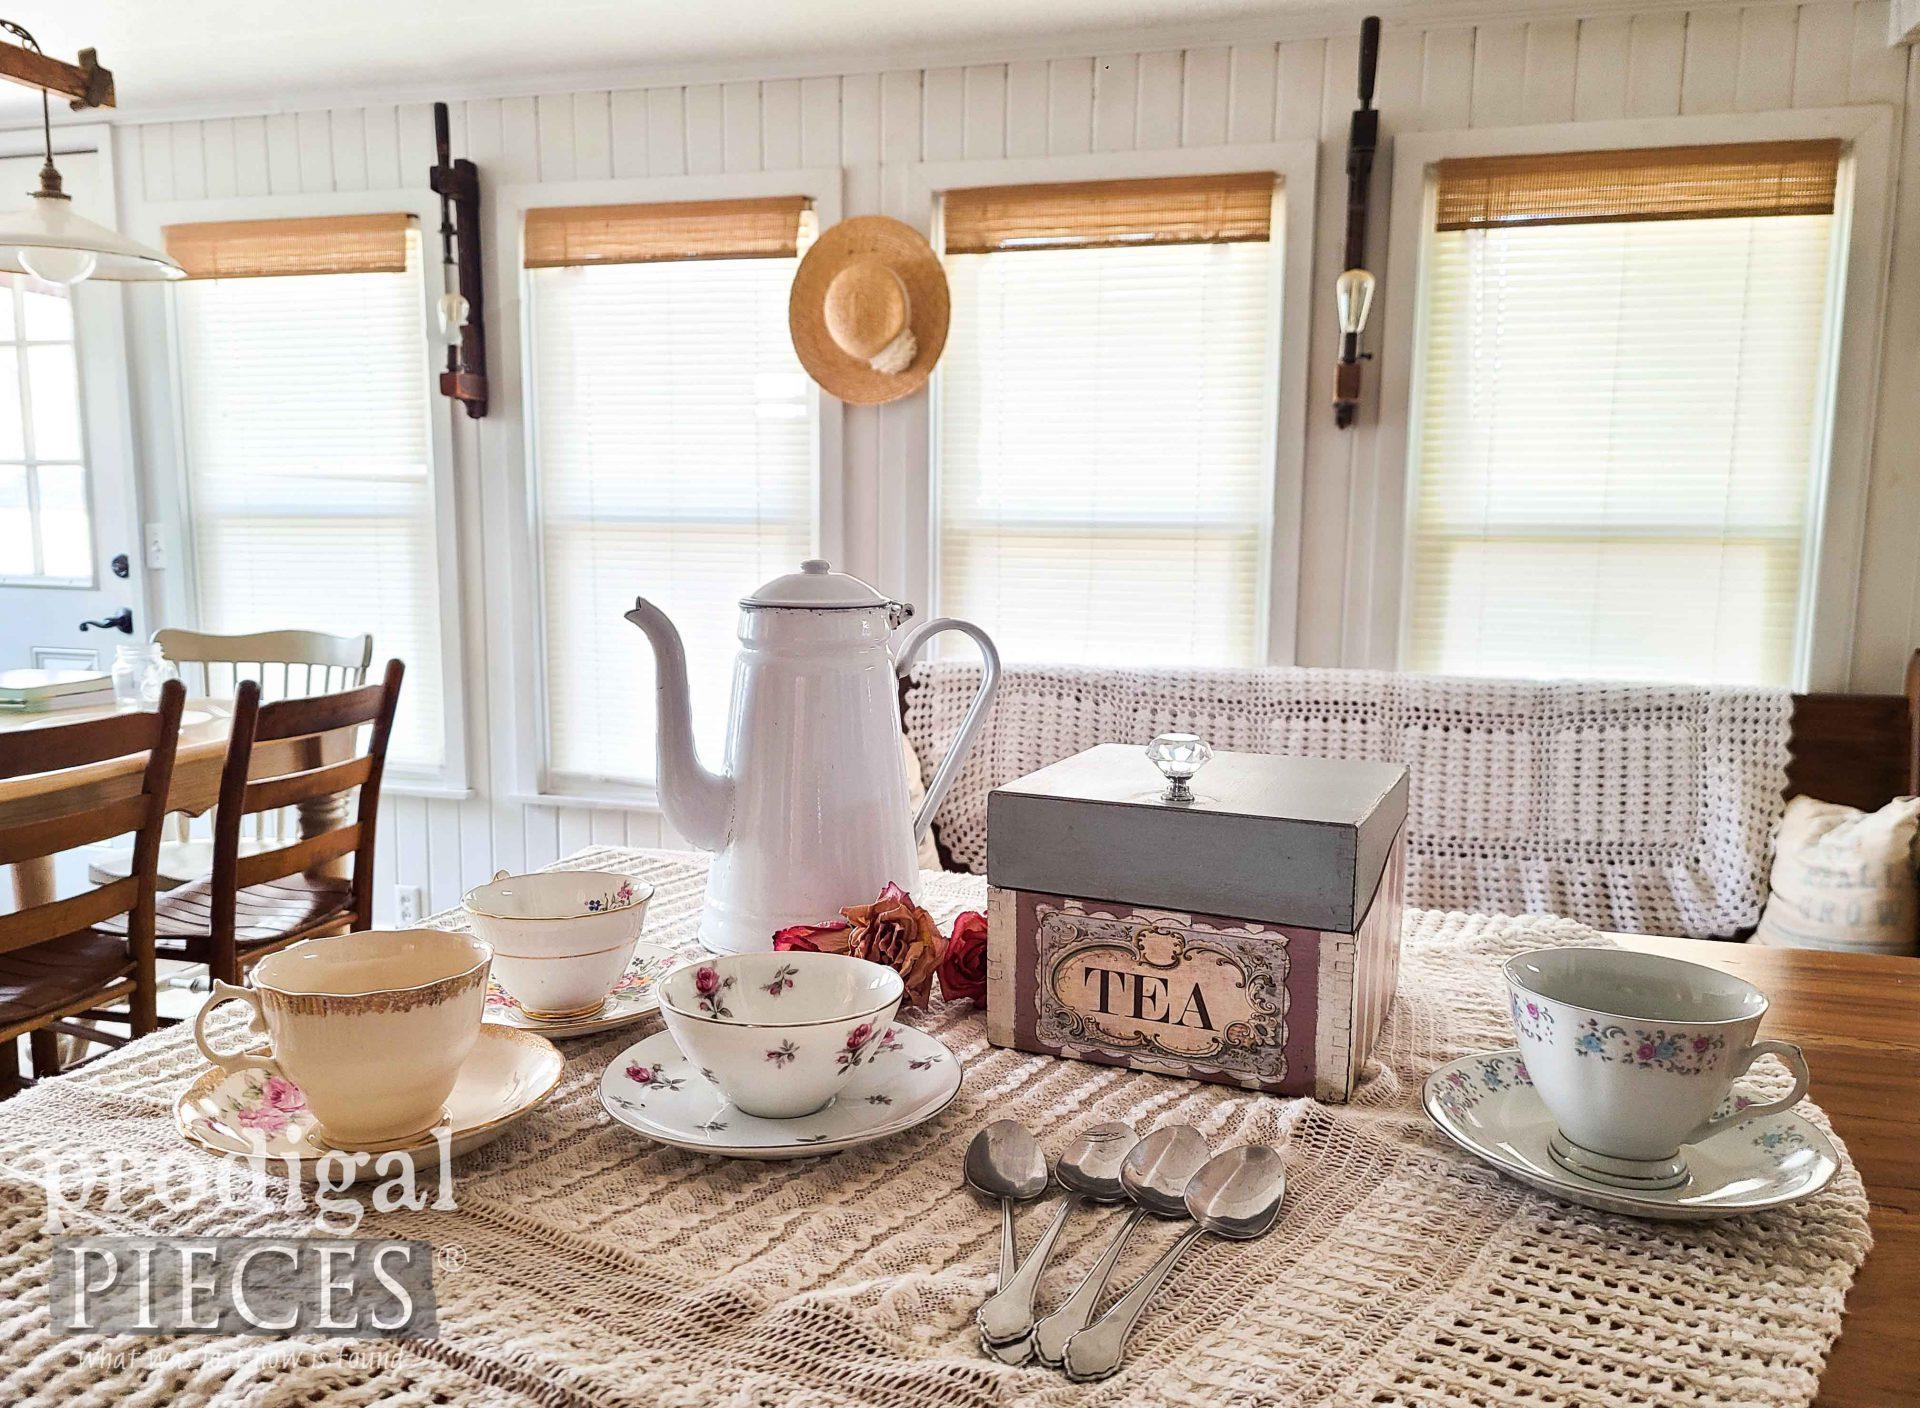 Farmhouse Cottage Style Vintage Tea Setting by Larissa of Prodigal Pieces | prodigalpieces.com #prodigalpieces #cottage #farmhouse #diy #tea #home